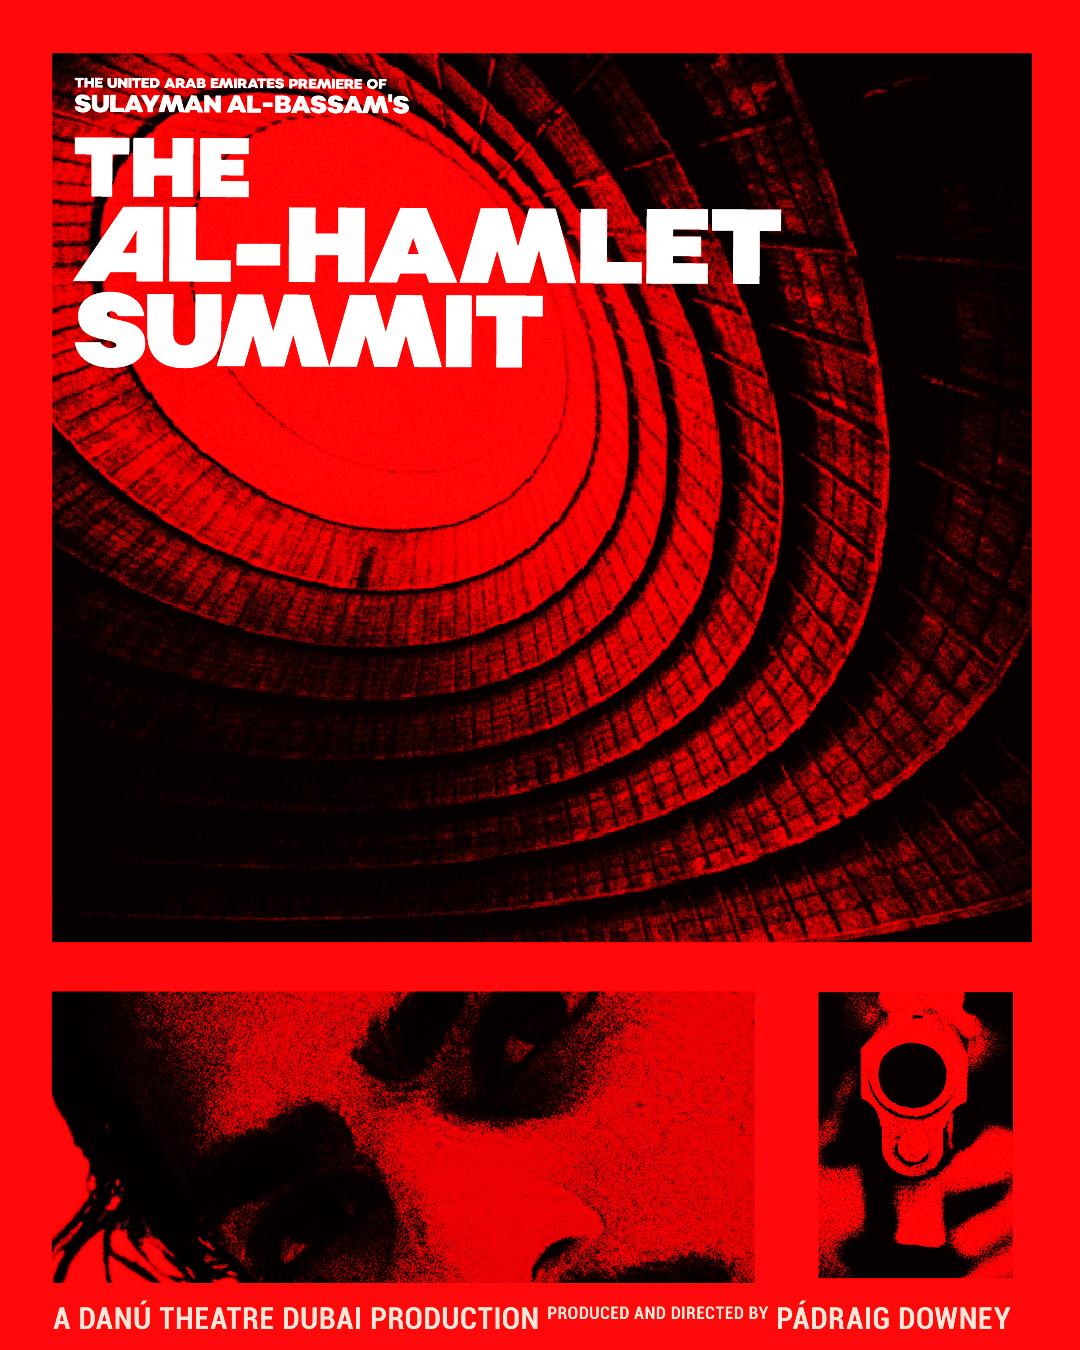 al-hamlet-foyer-screen1 copy.jpg